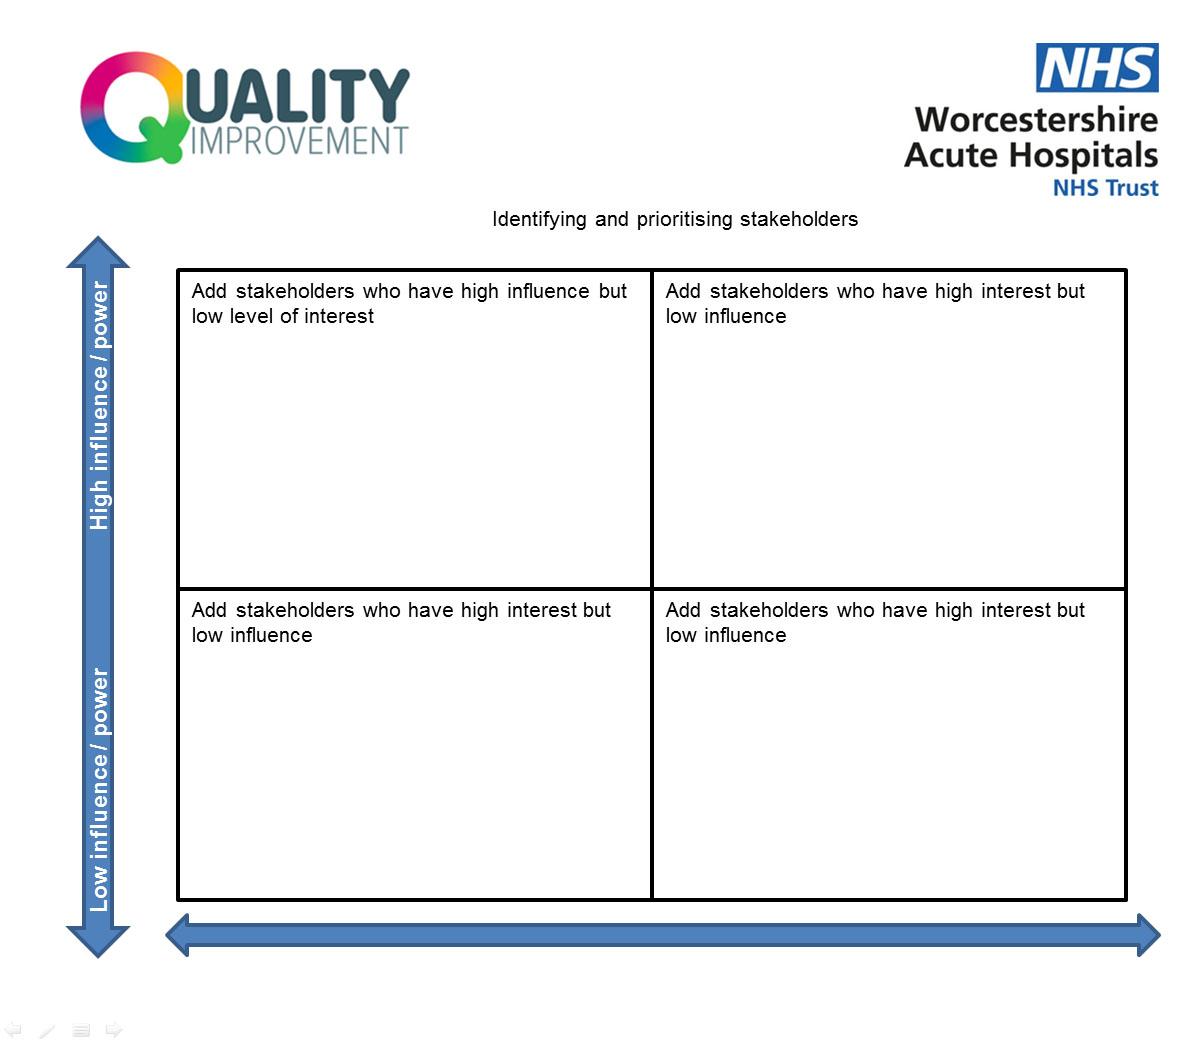 Quality Improvement Tools Worcestershire Acute Hospitals Nhs Trust